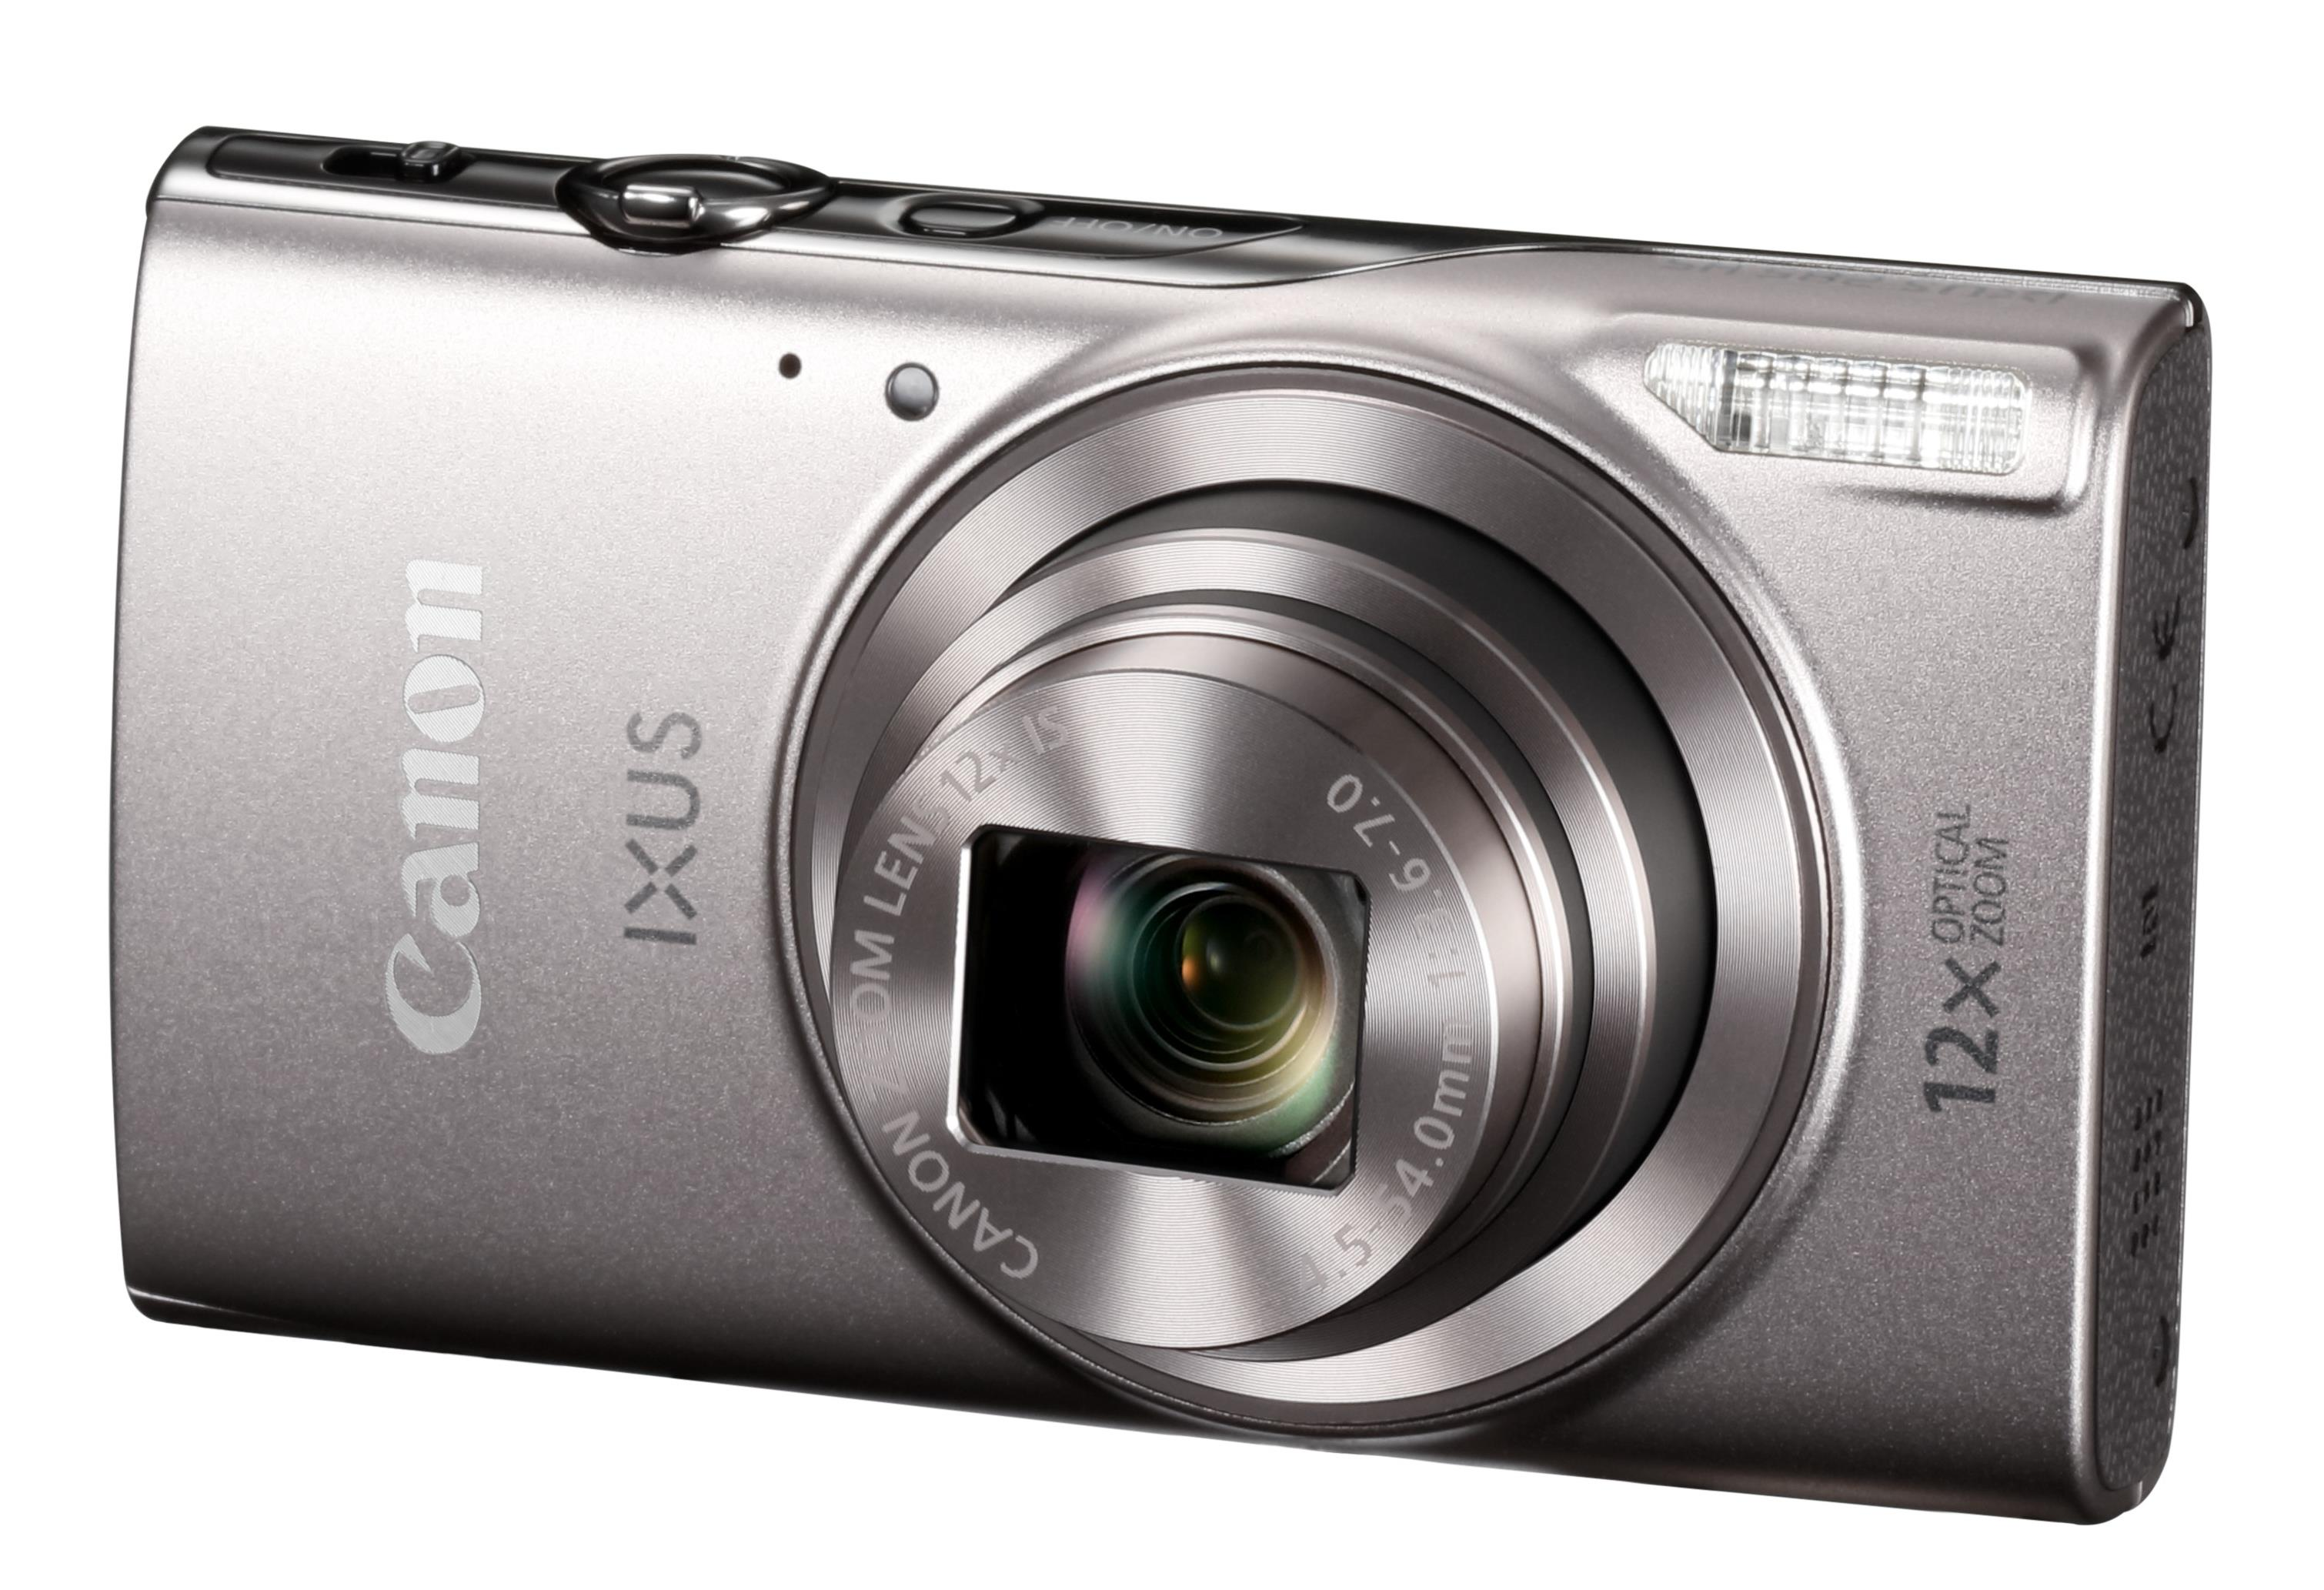 Canon IXUS 285 HS (3.0 inch Screen) Compact Digital Camera Kit 12x Optical Zoom Wifi (Silver)